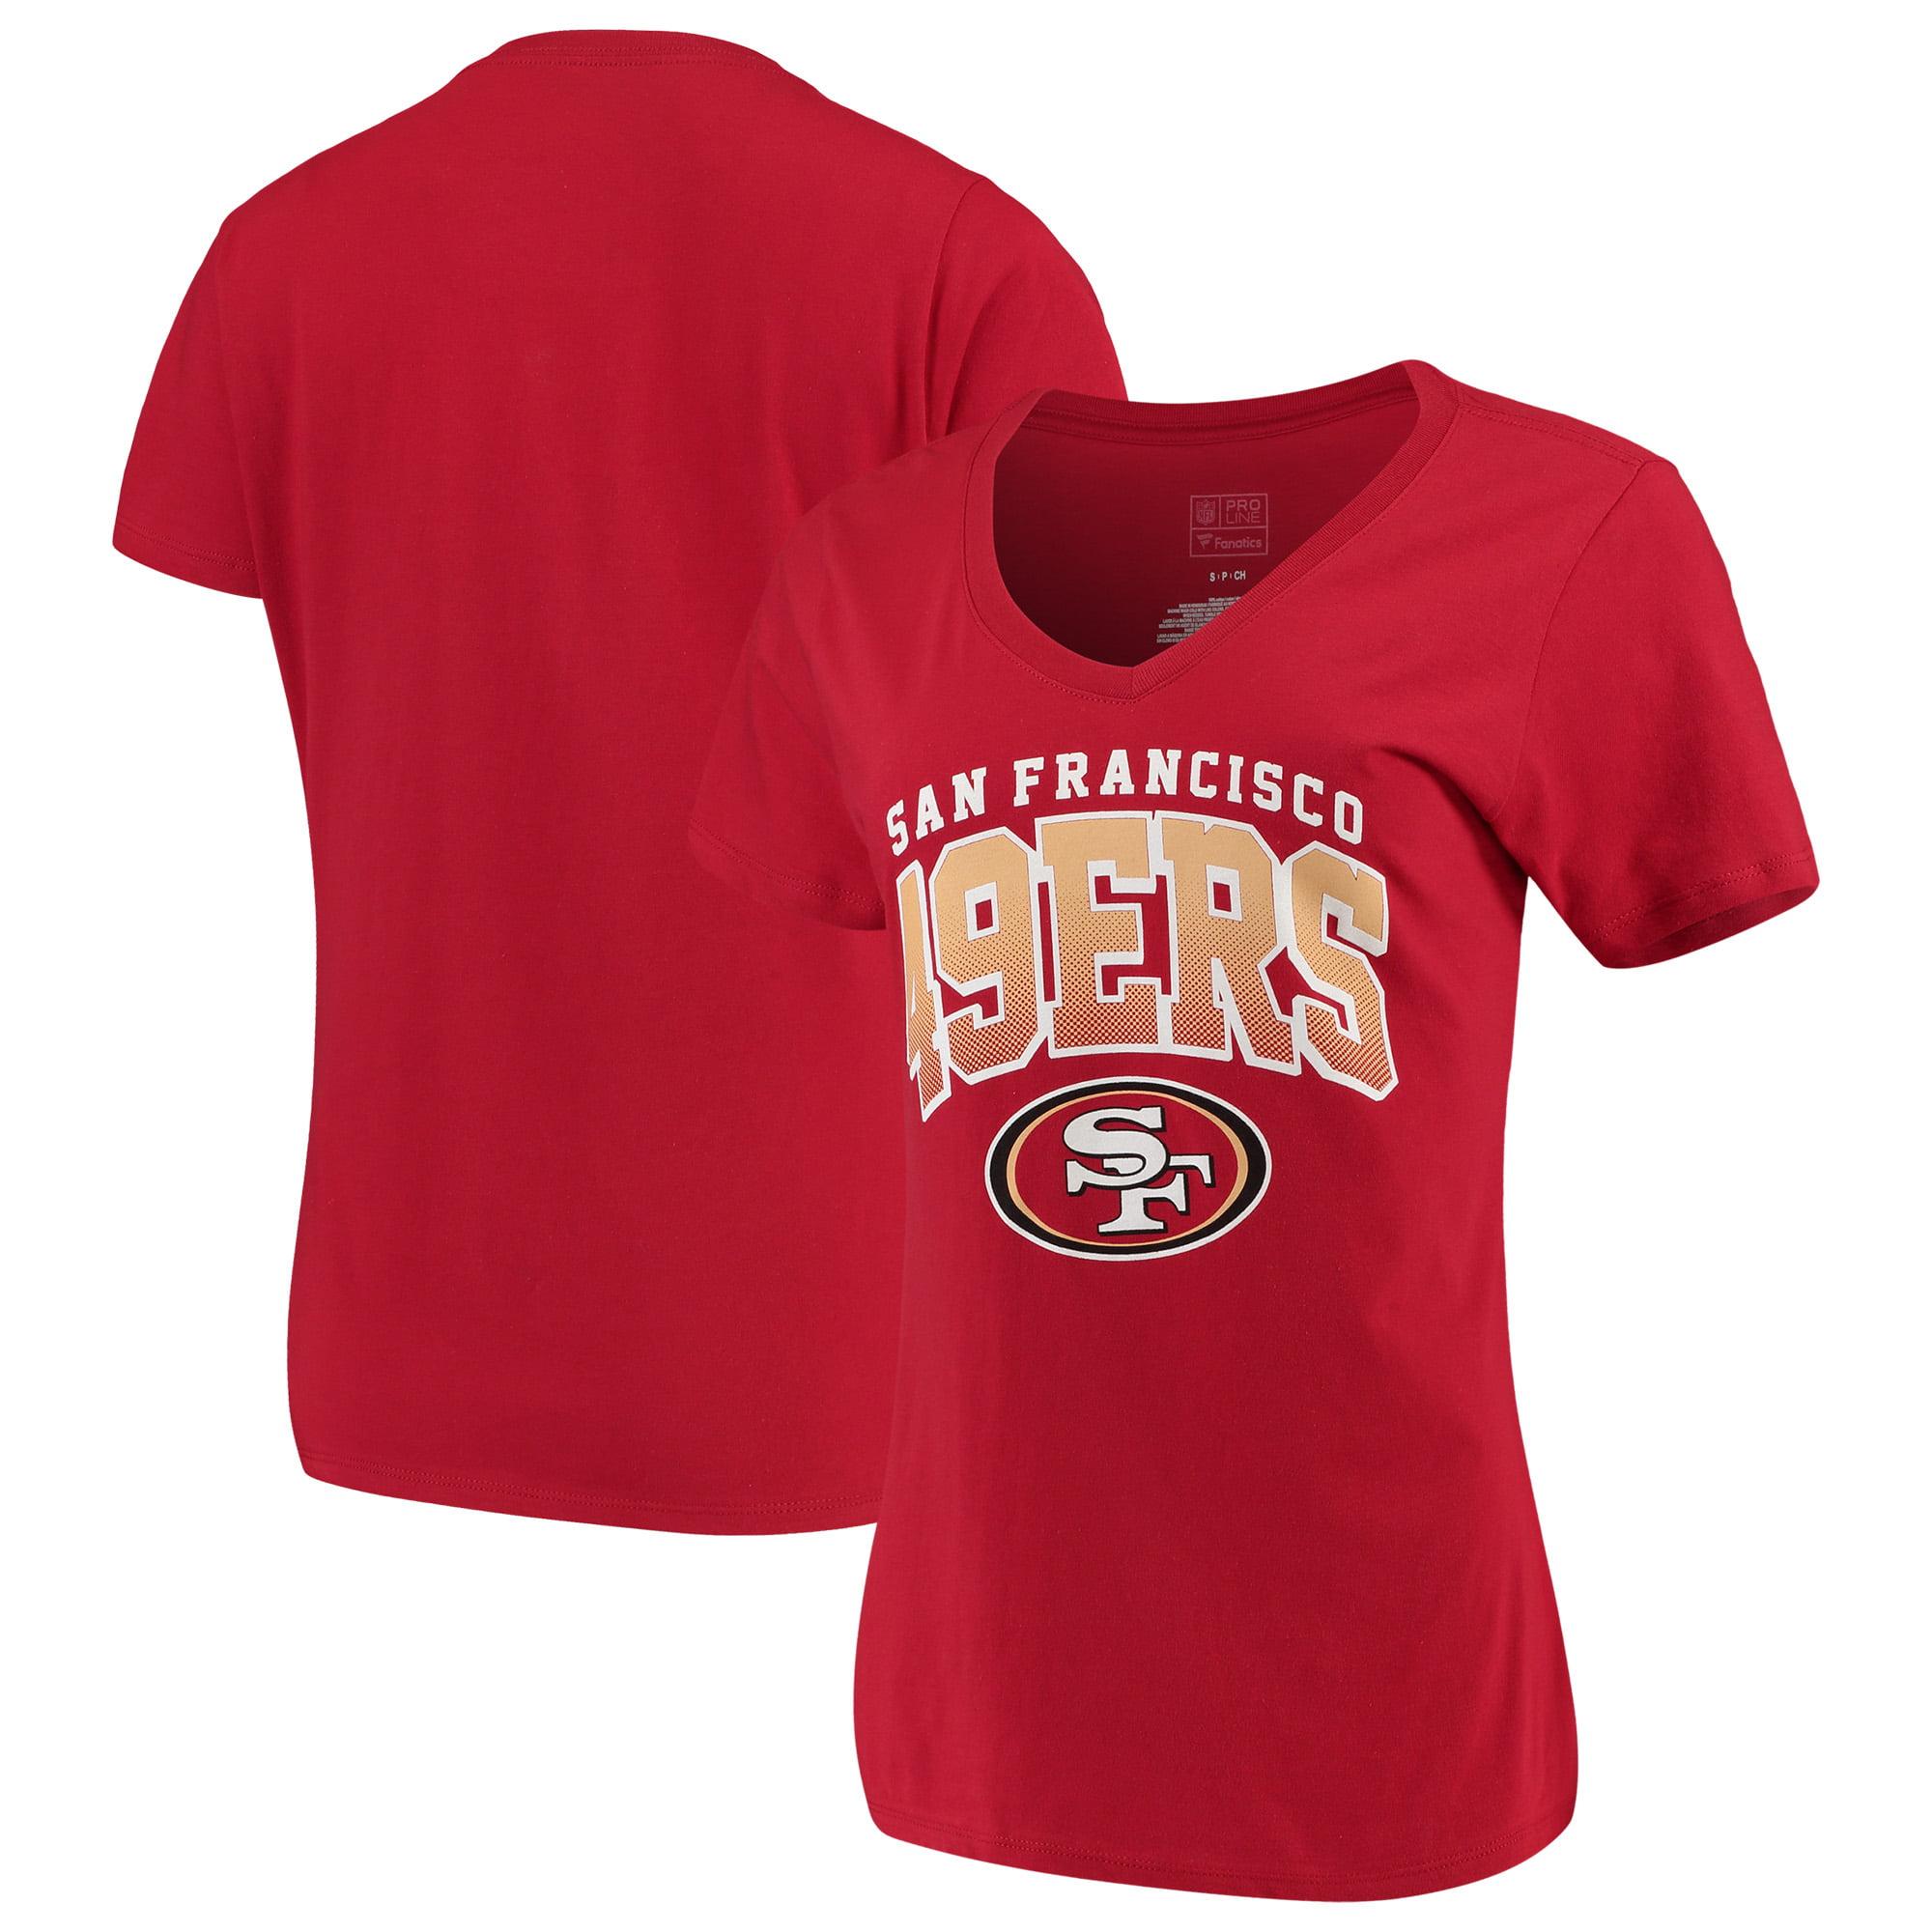 Women's Fanatics Branded Scarlet San Francisco 49ers Faded Arch V-Neck T-Shirt